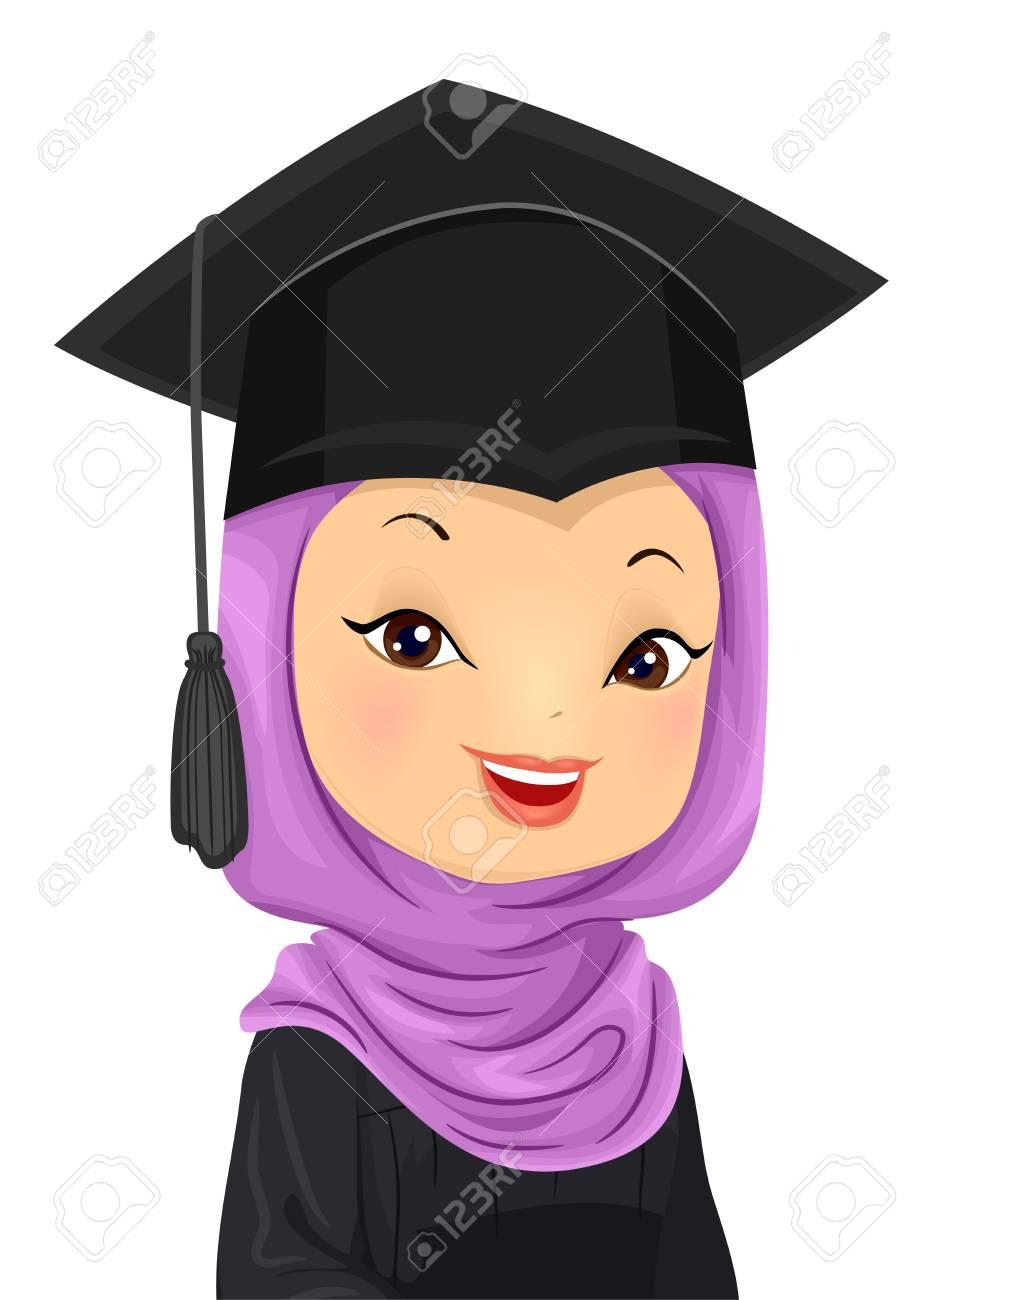 5221377e09b Illustration Of A Graduating Muslim Girl Wearing A Hijab And Stock